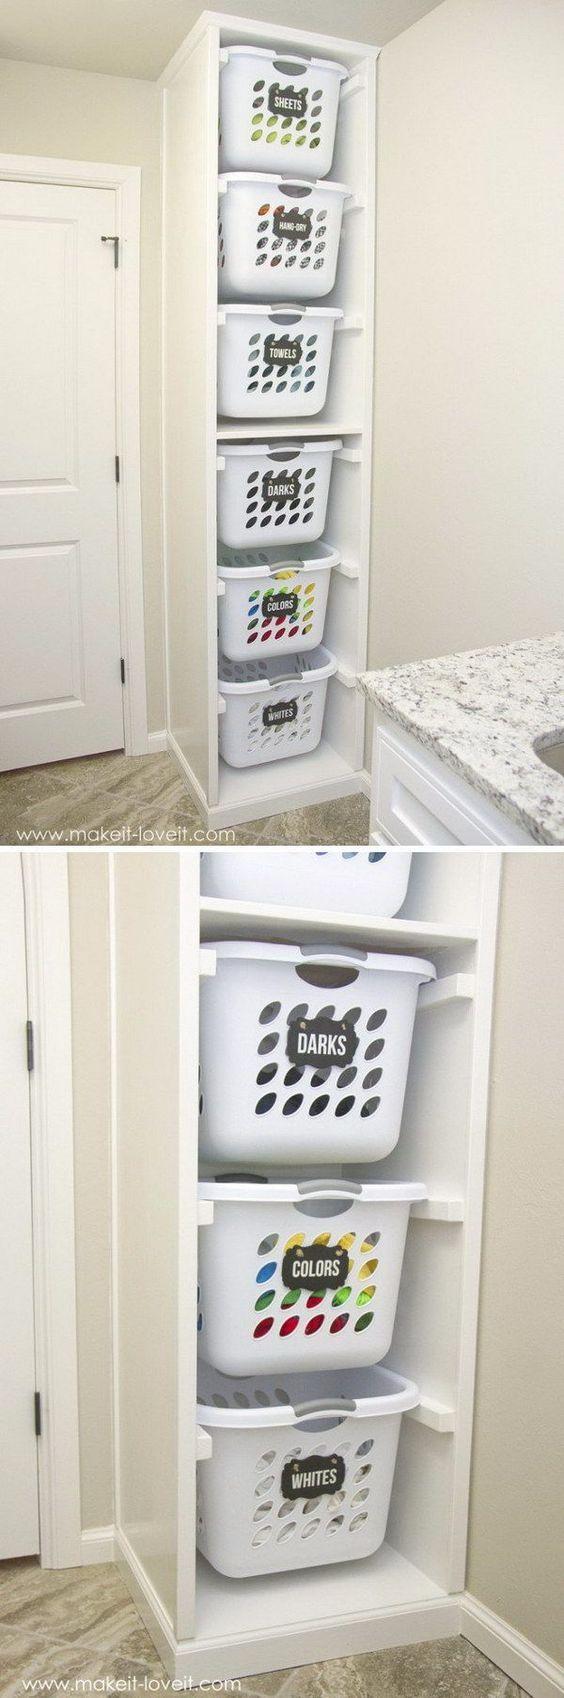 DIY Laundry Basket Organizer. More #ad – Wohnideen